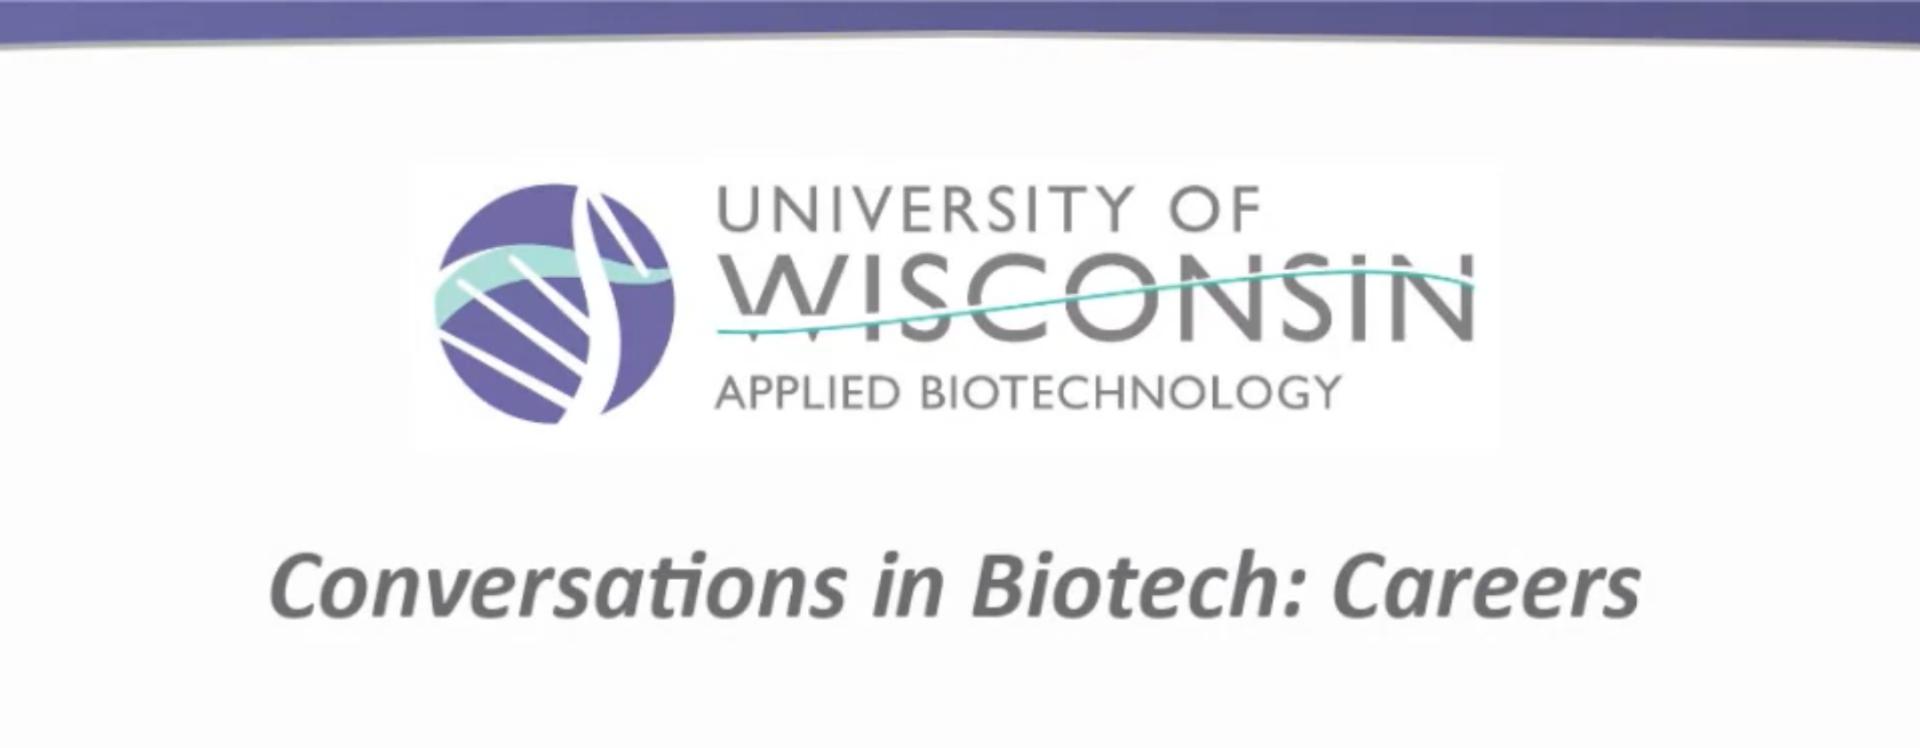 Conversations in Biotech: Careers: Webinar Recording + Q&A